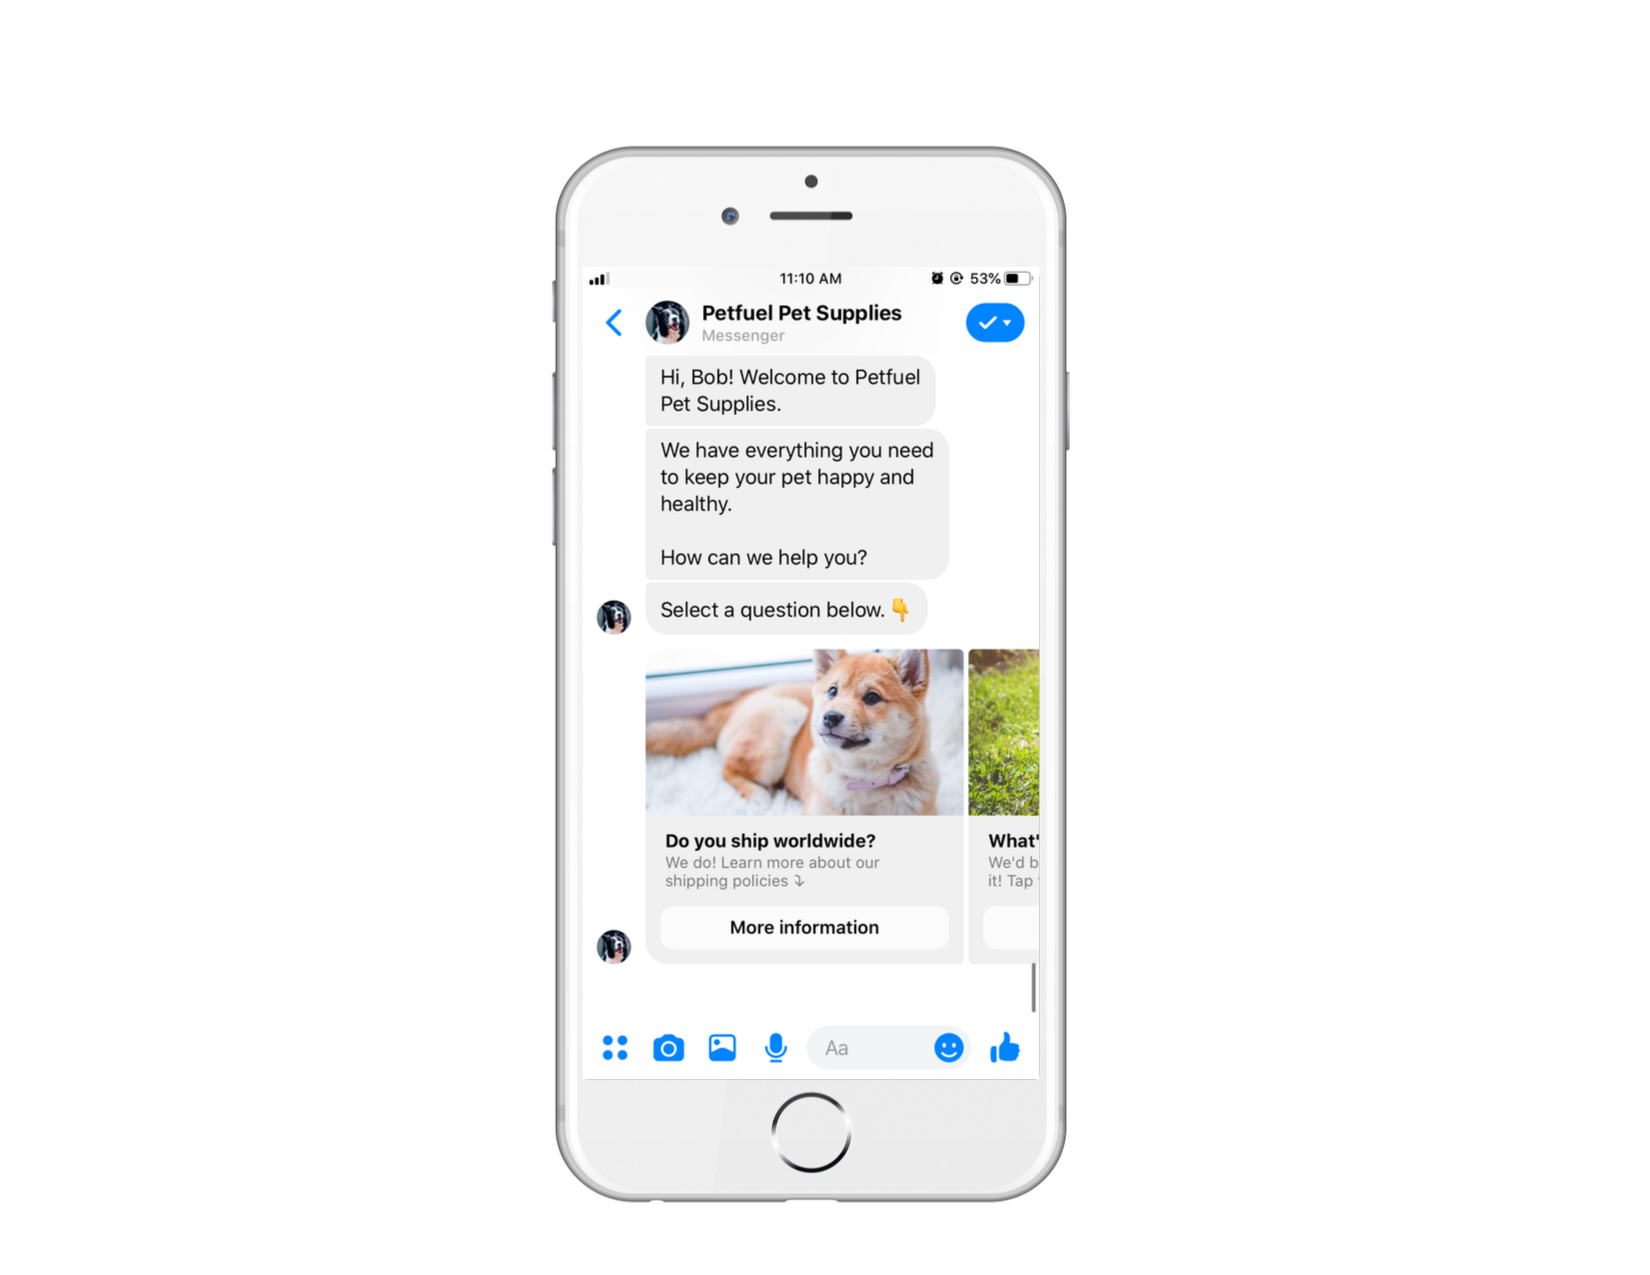 Chatbot answering basic FAQs